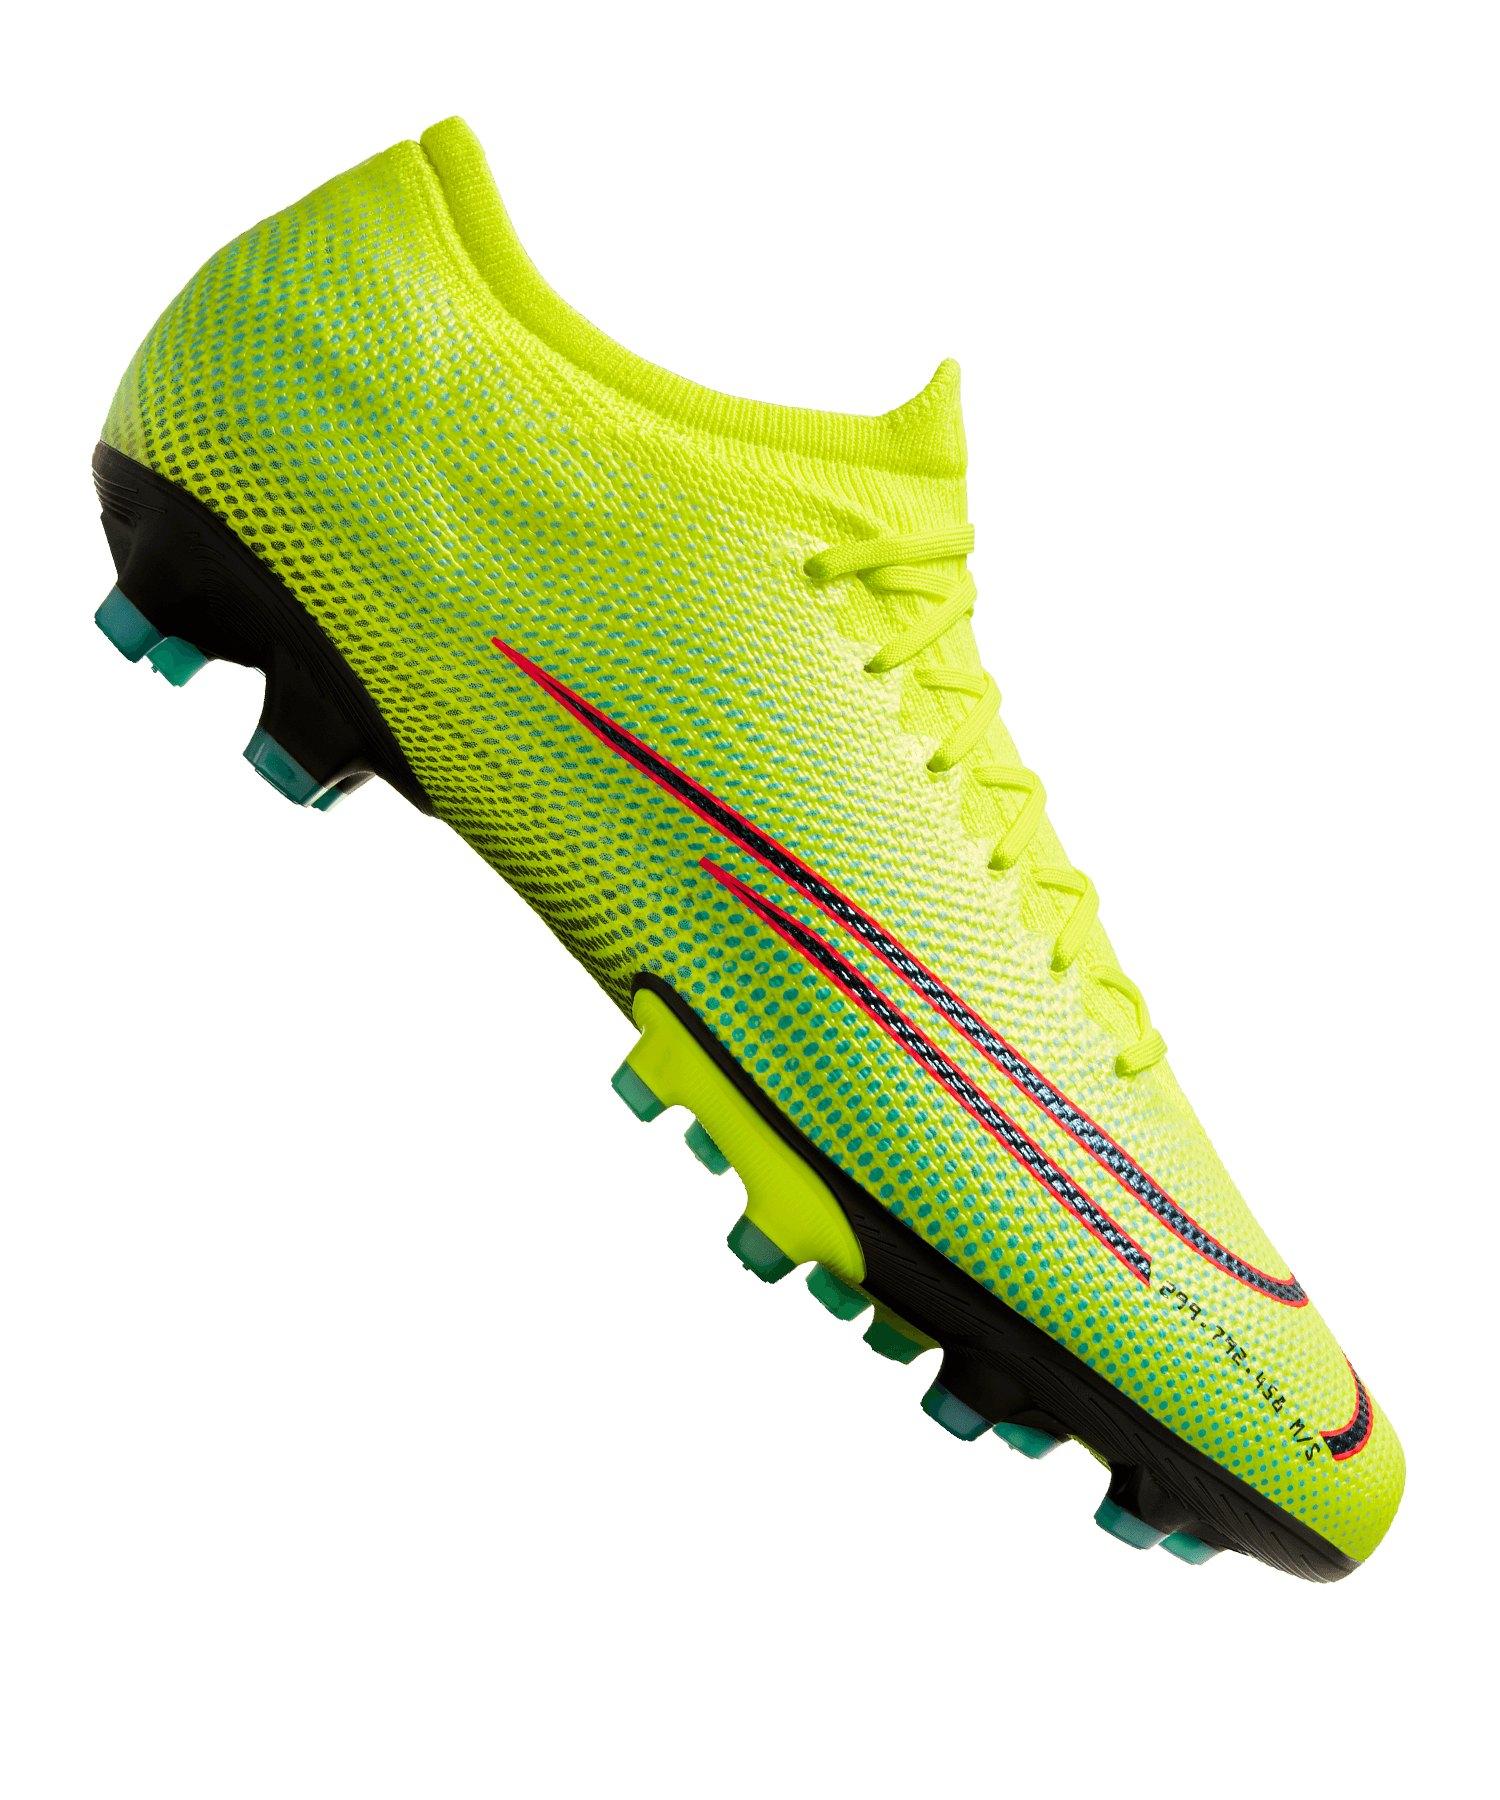 Nike Mercurial Vapor XIII Dreamspeed Pro AG-Pro Gelb F703 - gelb